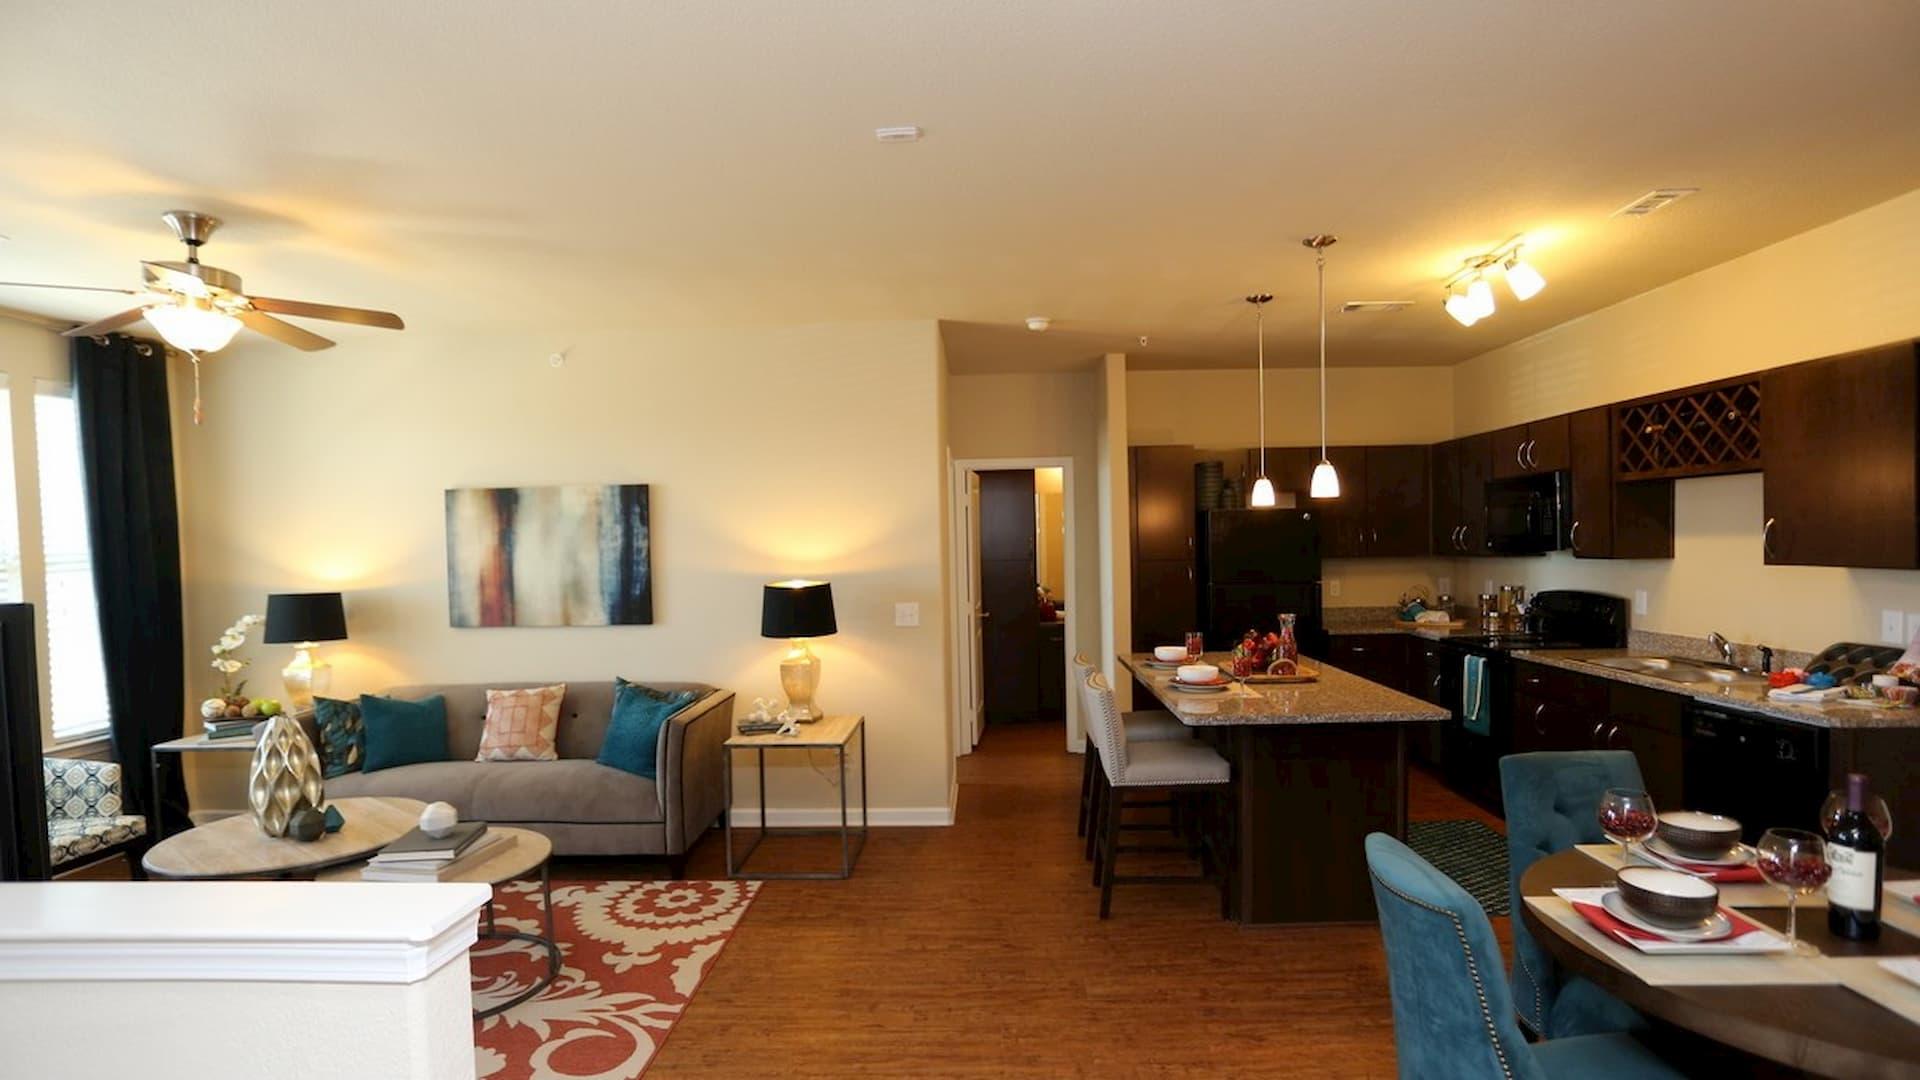 springs-at-alamo-ranch-apartments-san-antonio-tx-two-bedroom-1